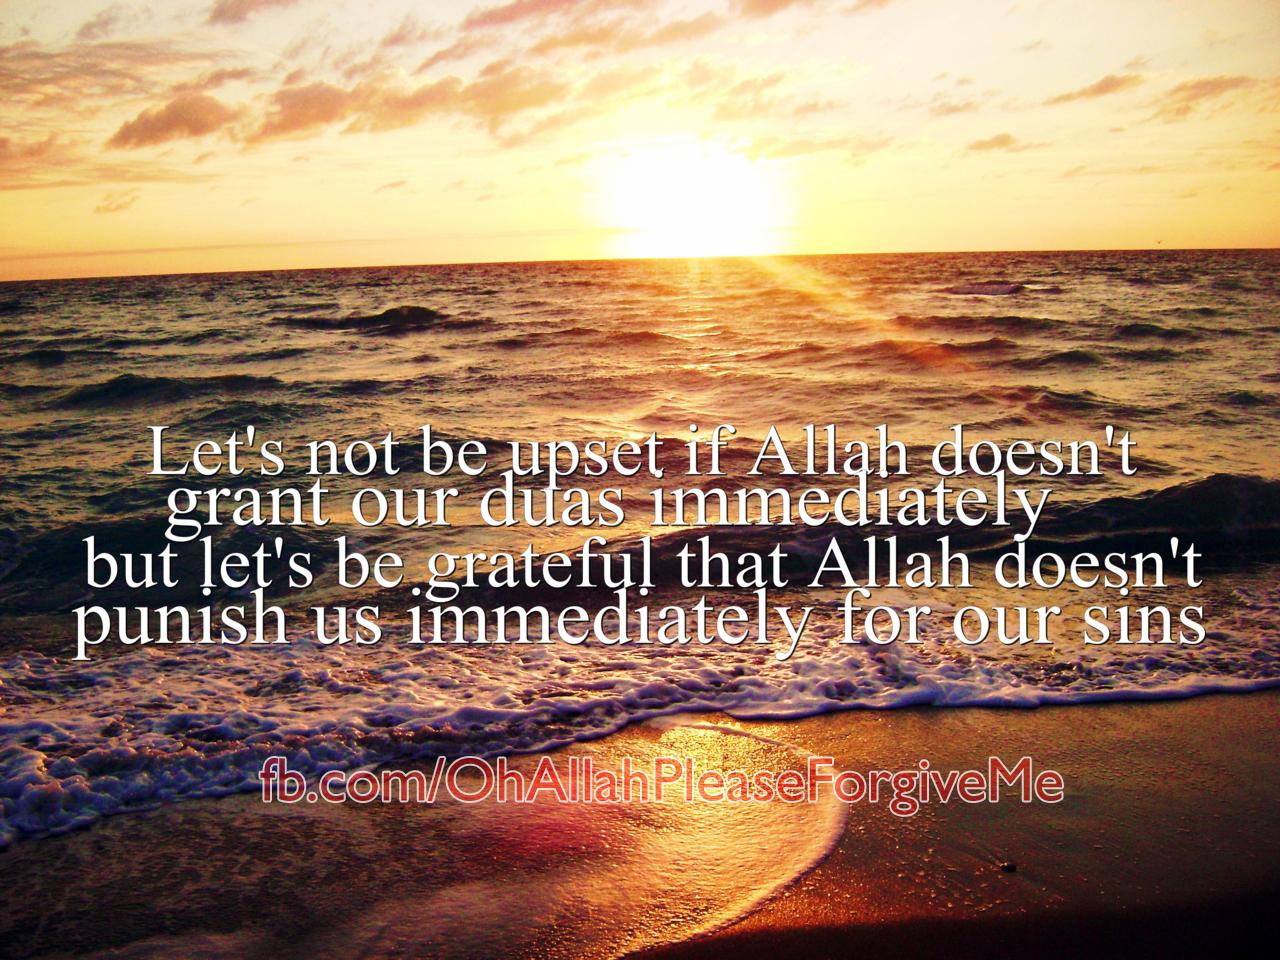 Muslim quote #2